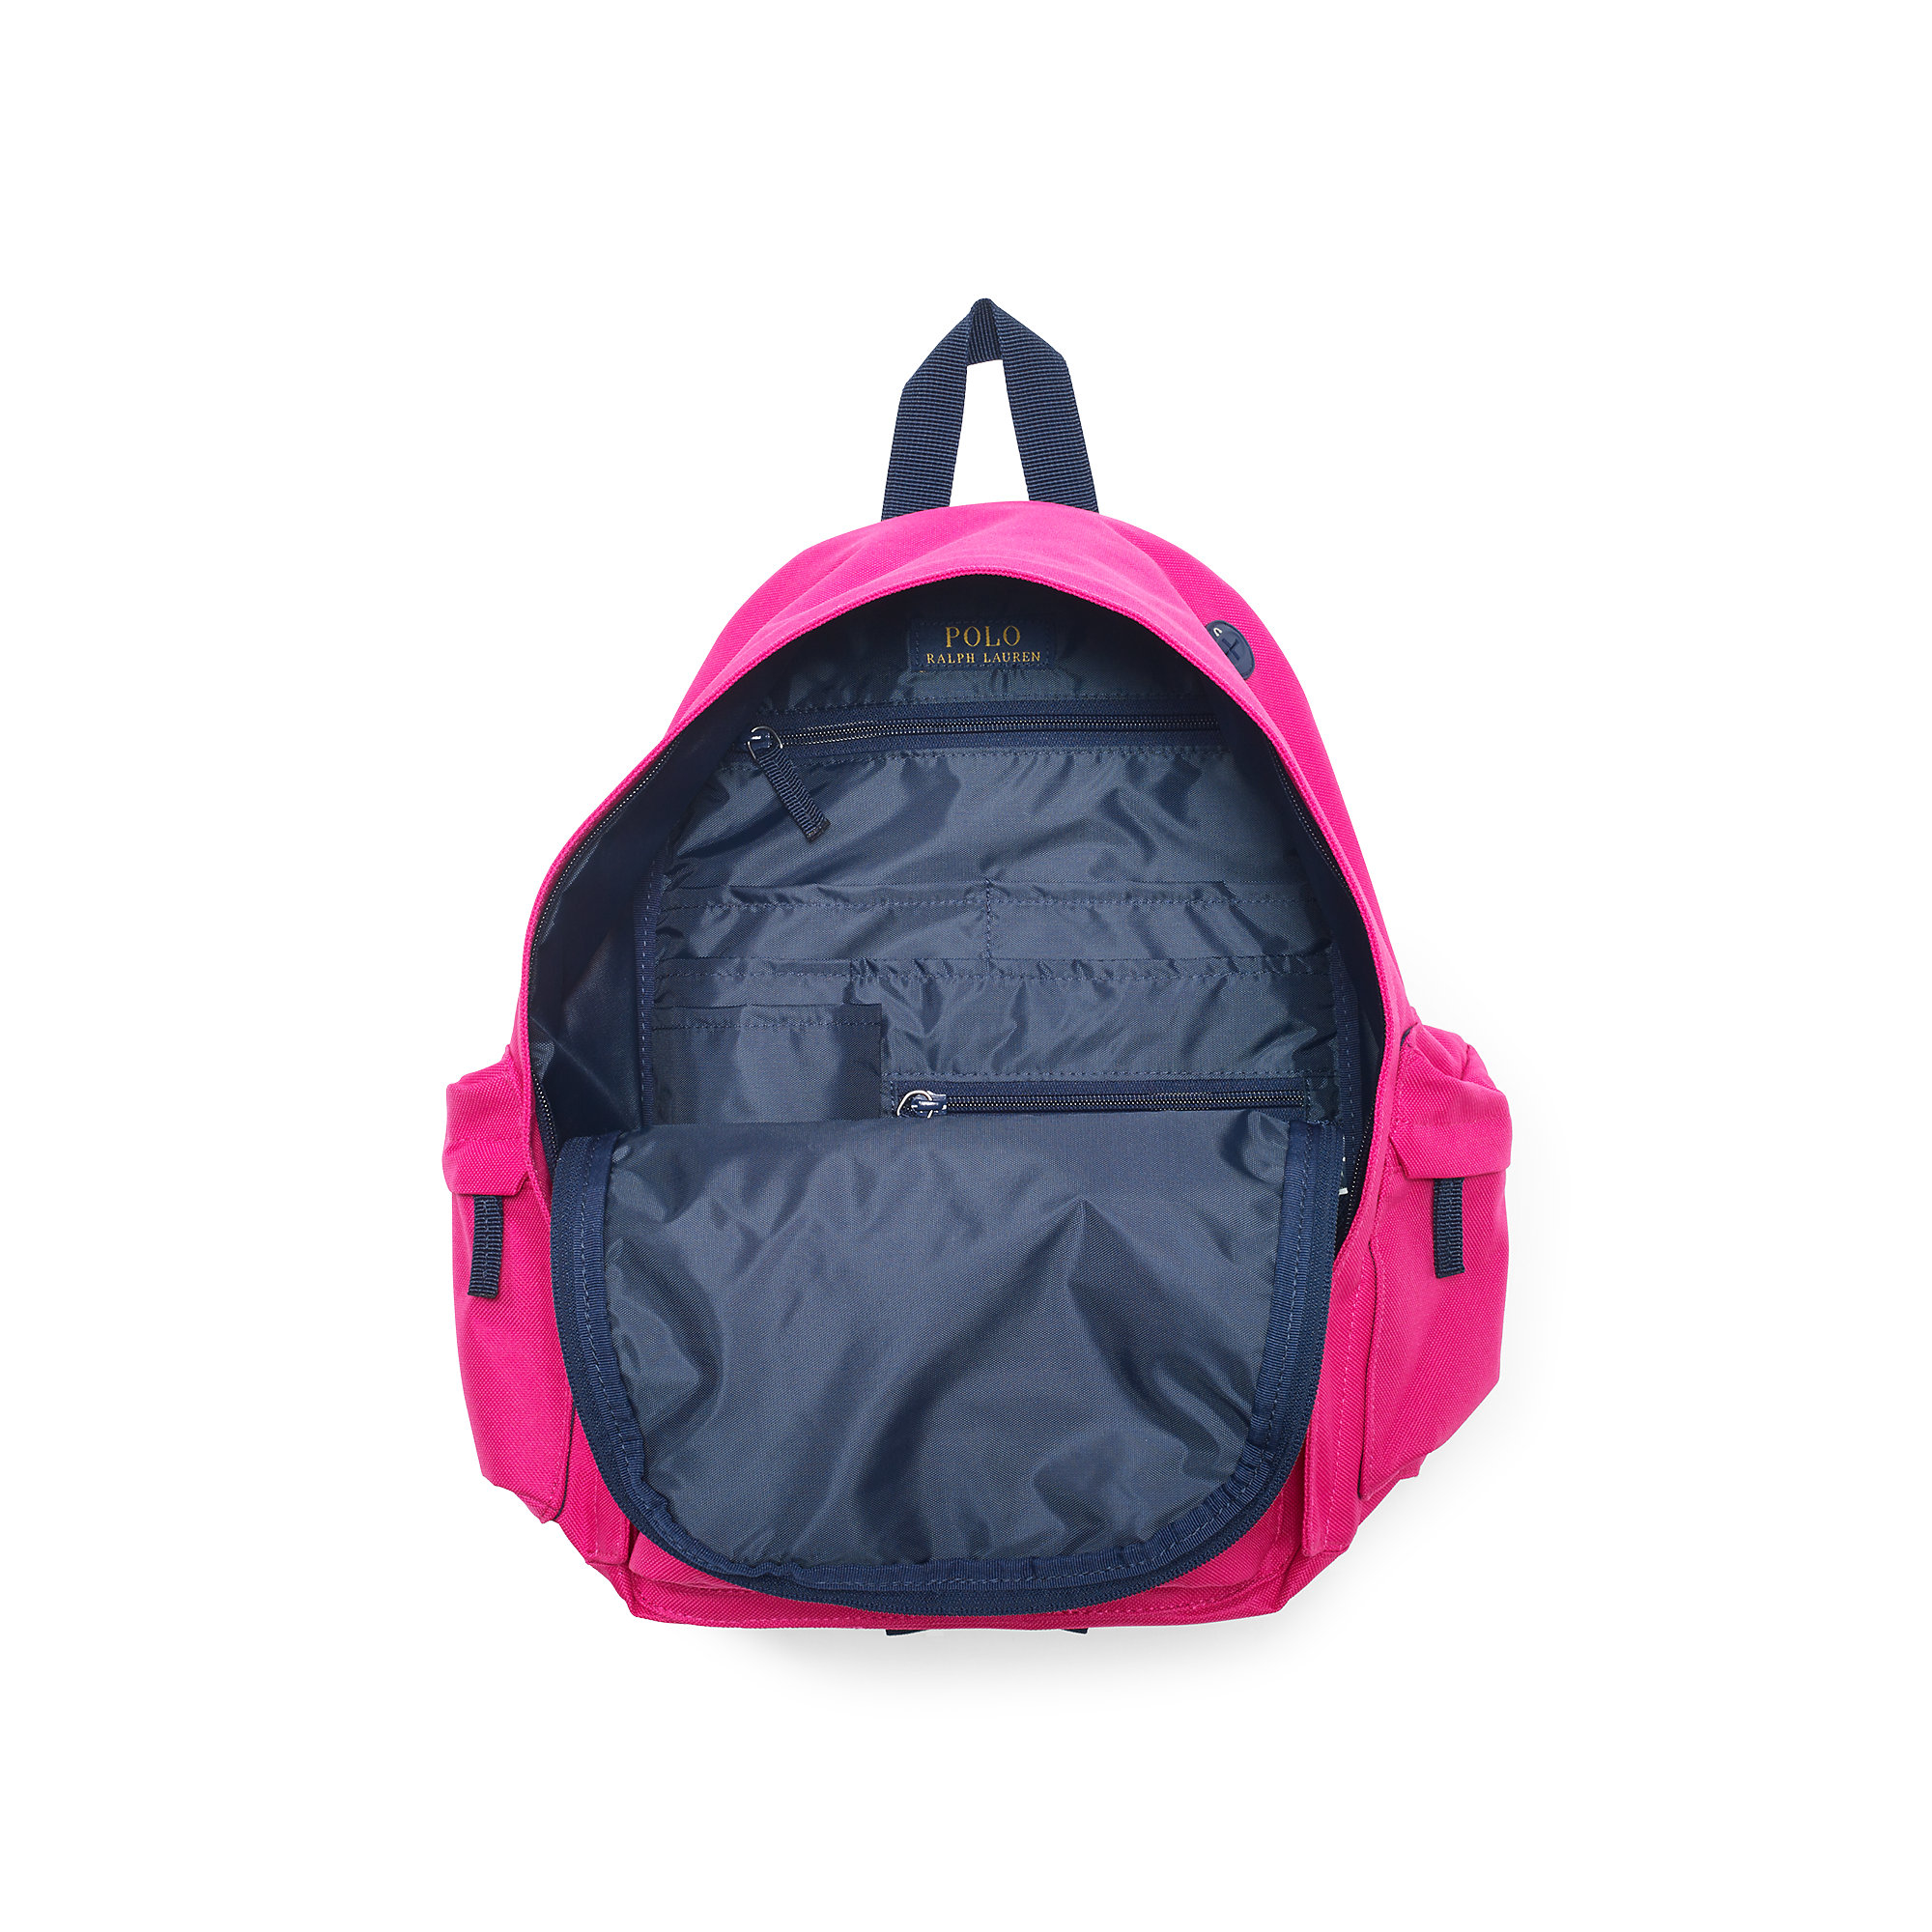 c1966dac07790 Lyst - Ralph Lauren Big Pony Large Backpack in Purple